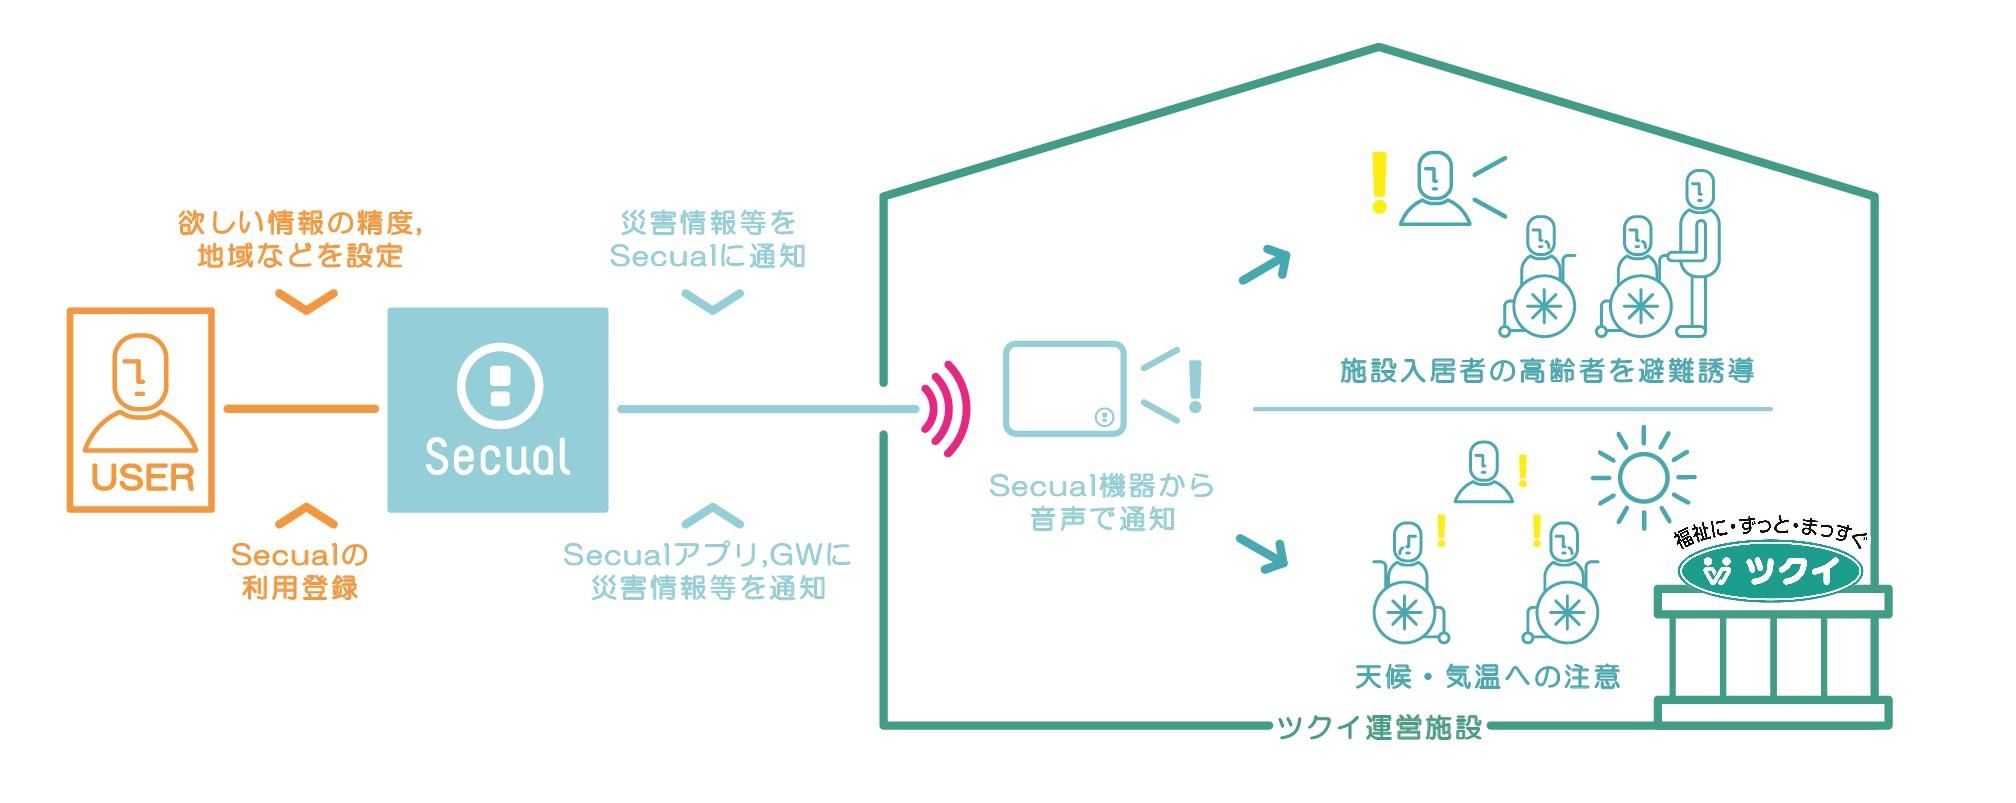 Secual機器による災害情報の音声通知イメージ